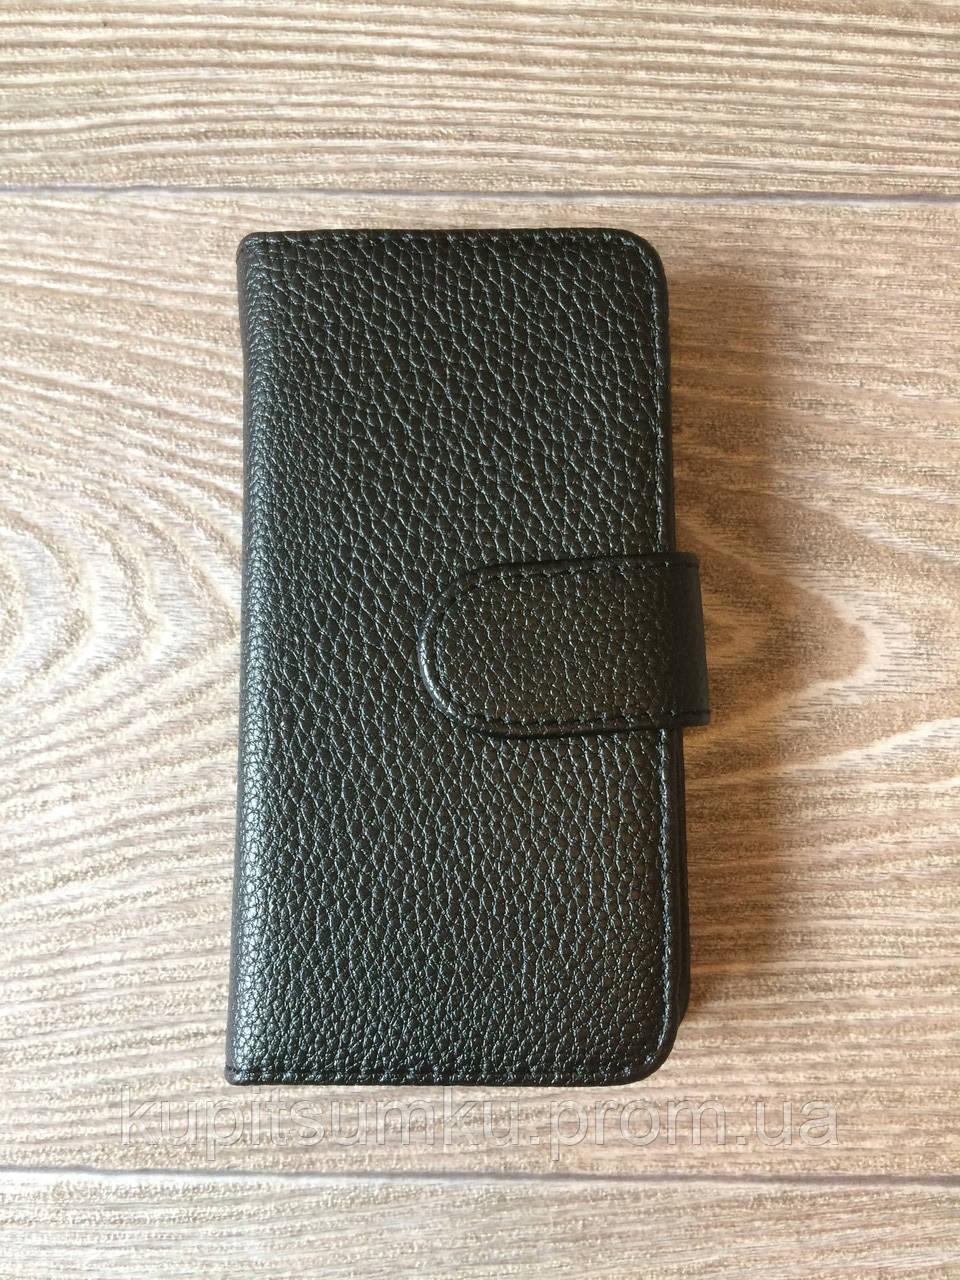 BlackBerry 9700 9780 9790 Чехол